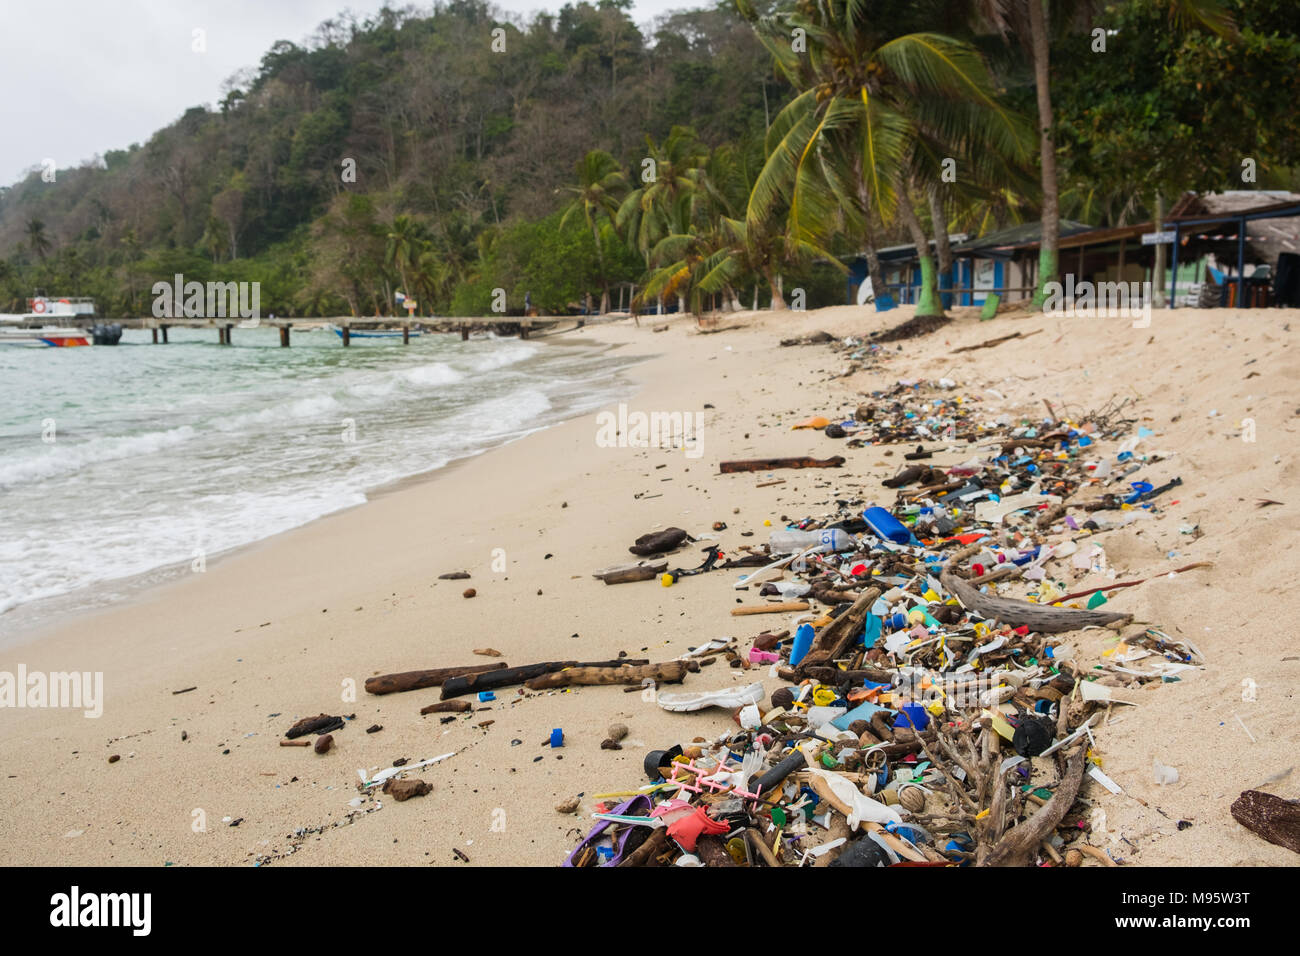 Garbage On Beach Photos Garbage On Beach Images Alamy